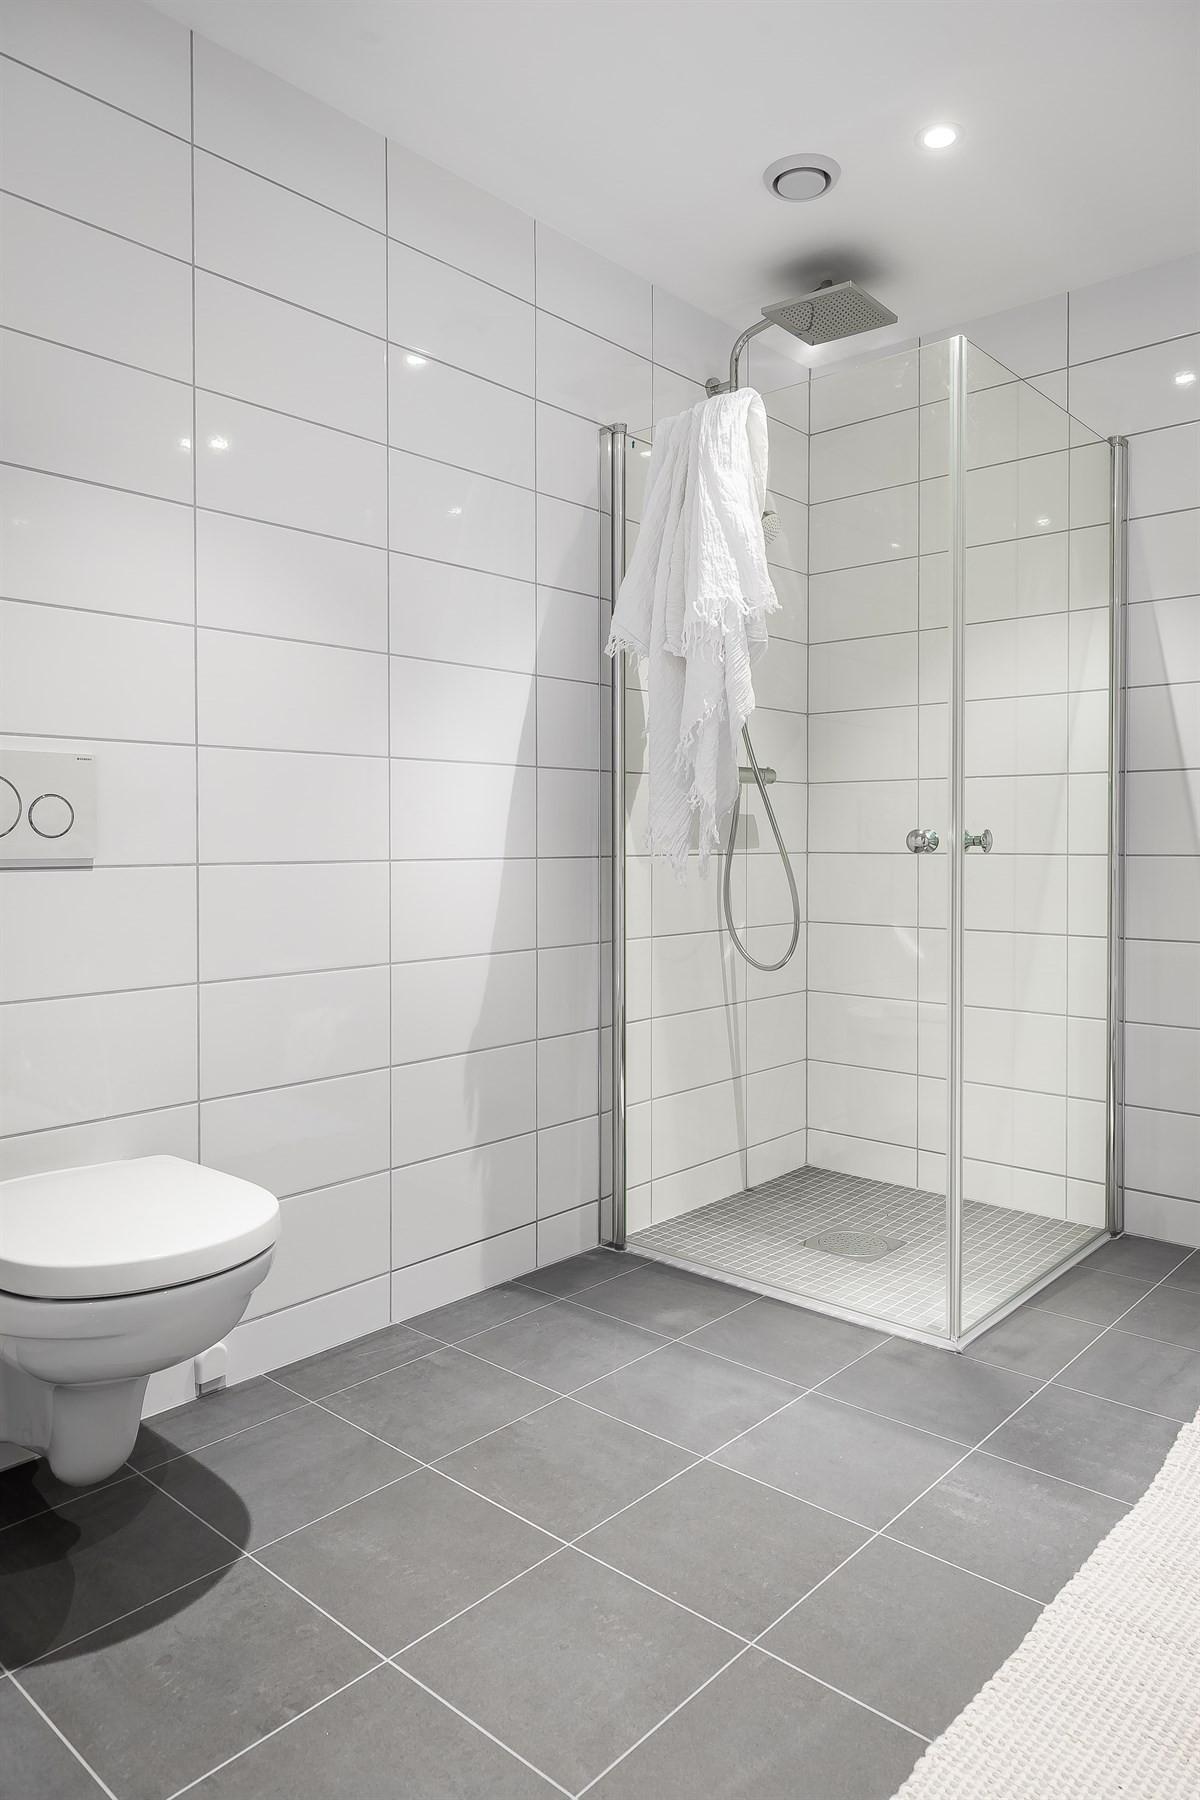 Vegghengt wc, dusjhjørne og gulvvarme